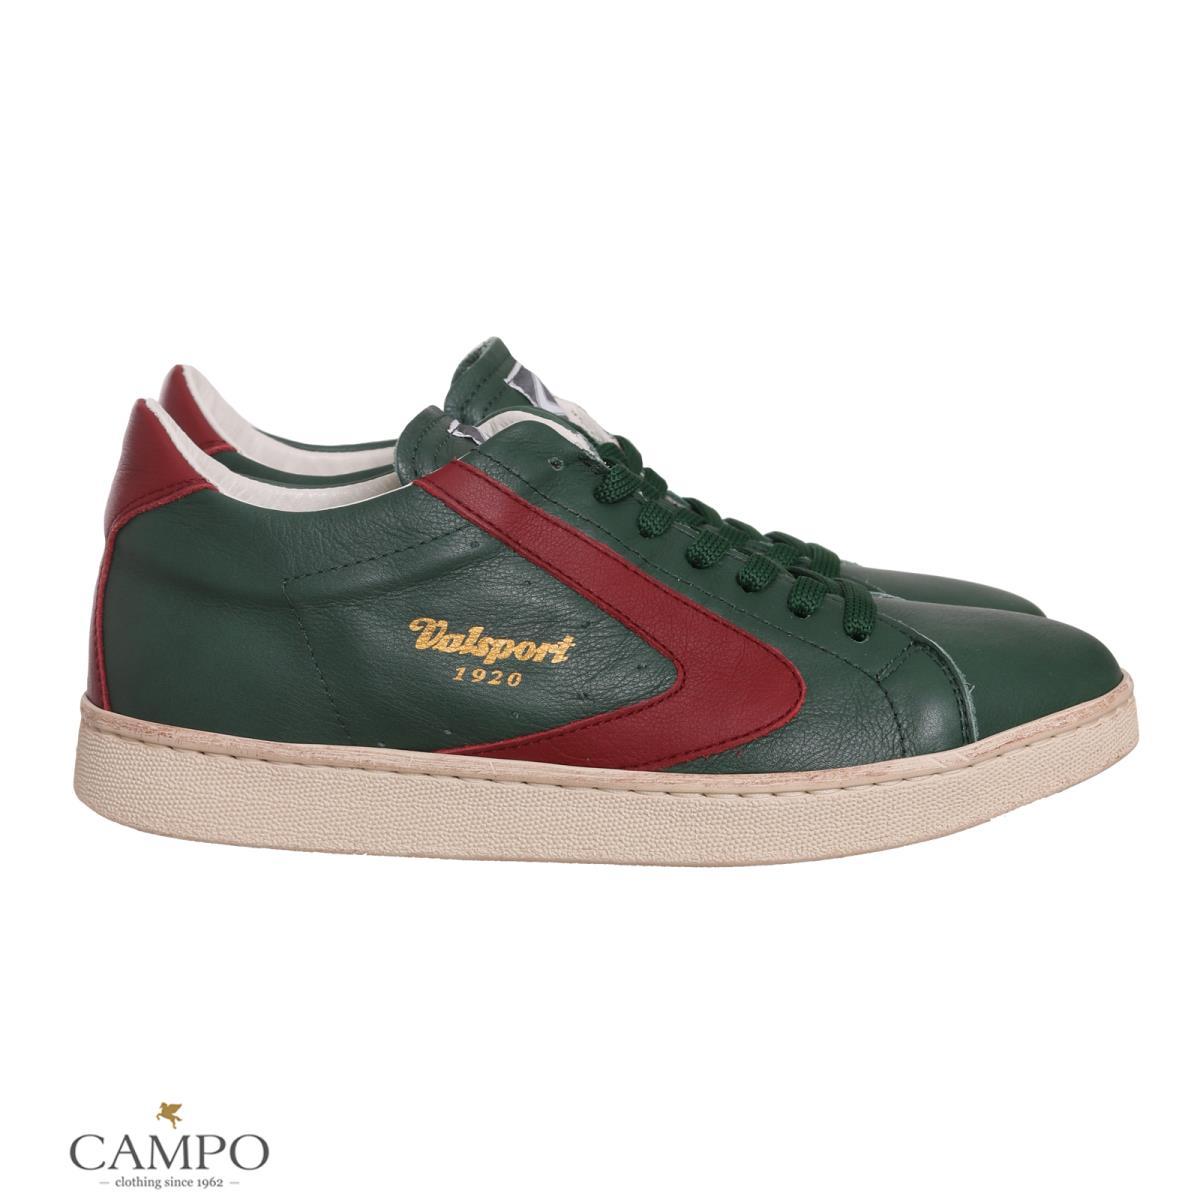 buy online 1503f a8f11 Valsport scarpe tournament | Campo Moda